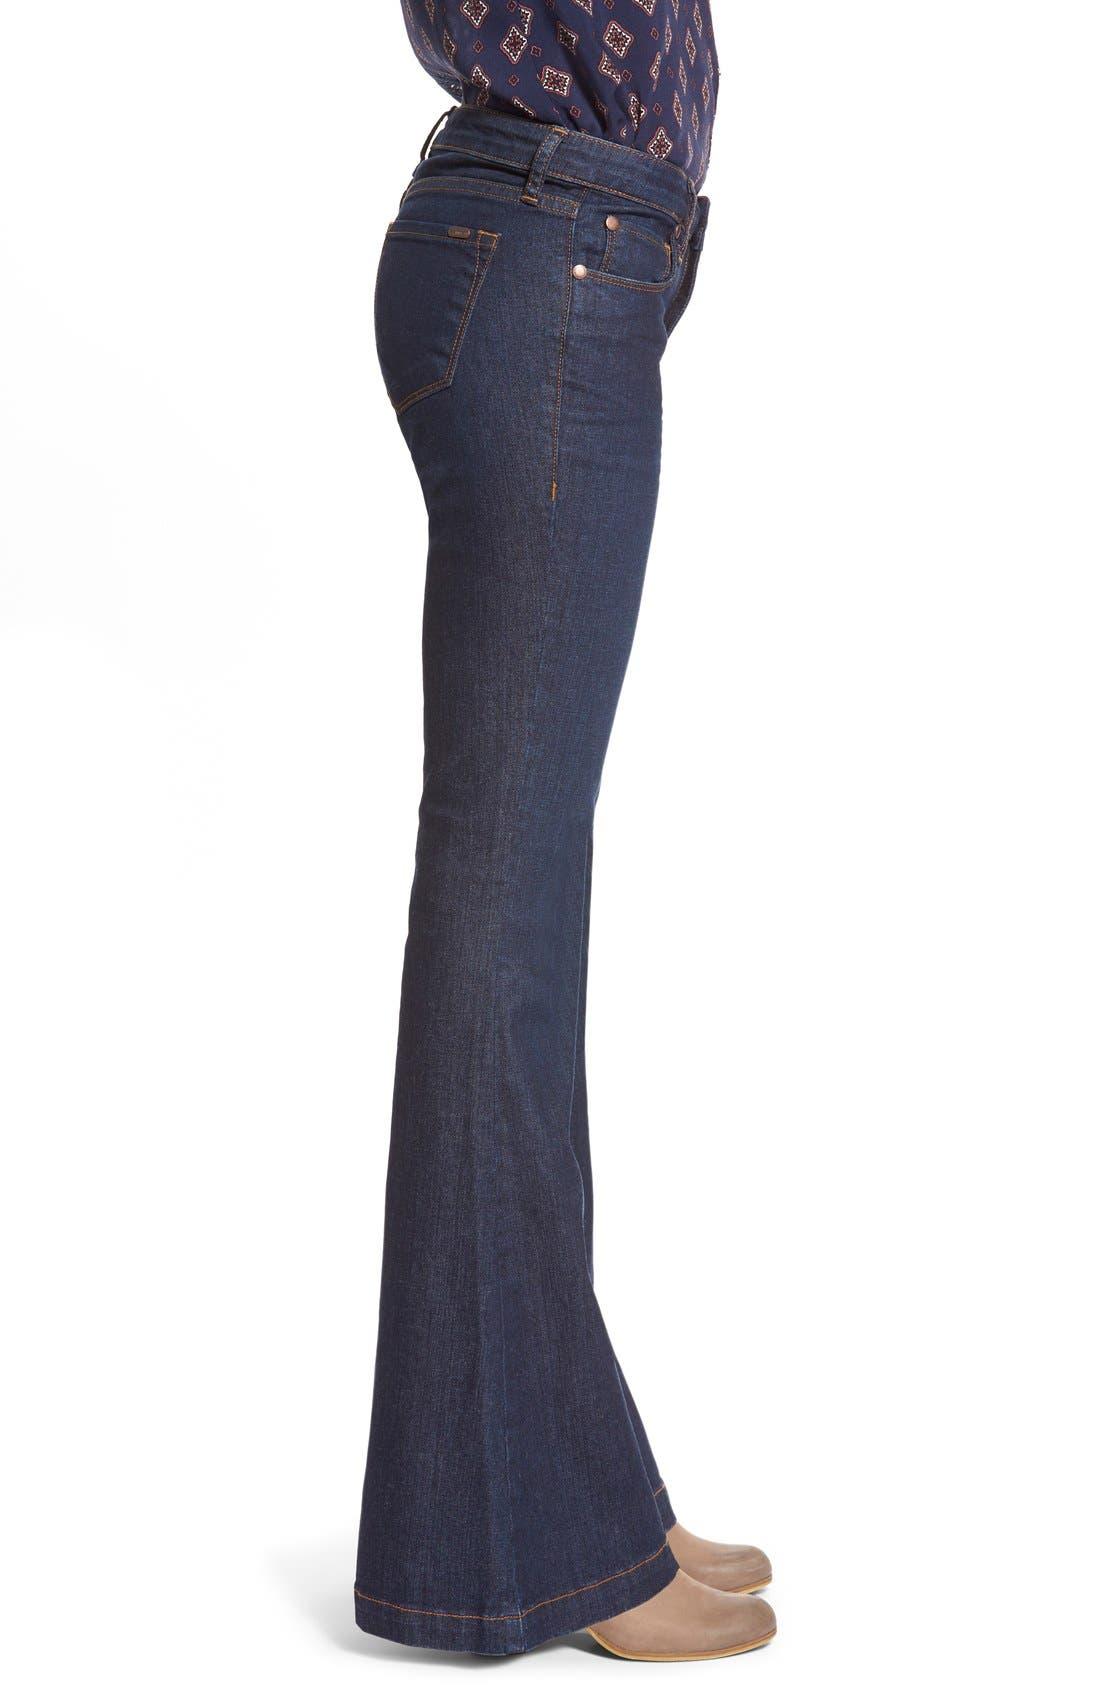 Alternate Image 3  - STSBlue 'Nikki' Flare Leg Skinny Jeans (Napa)